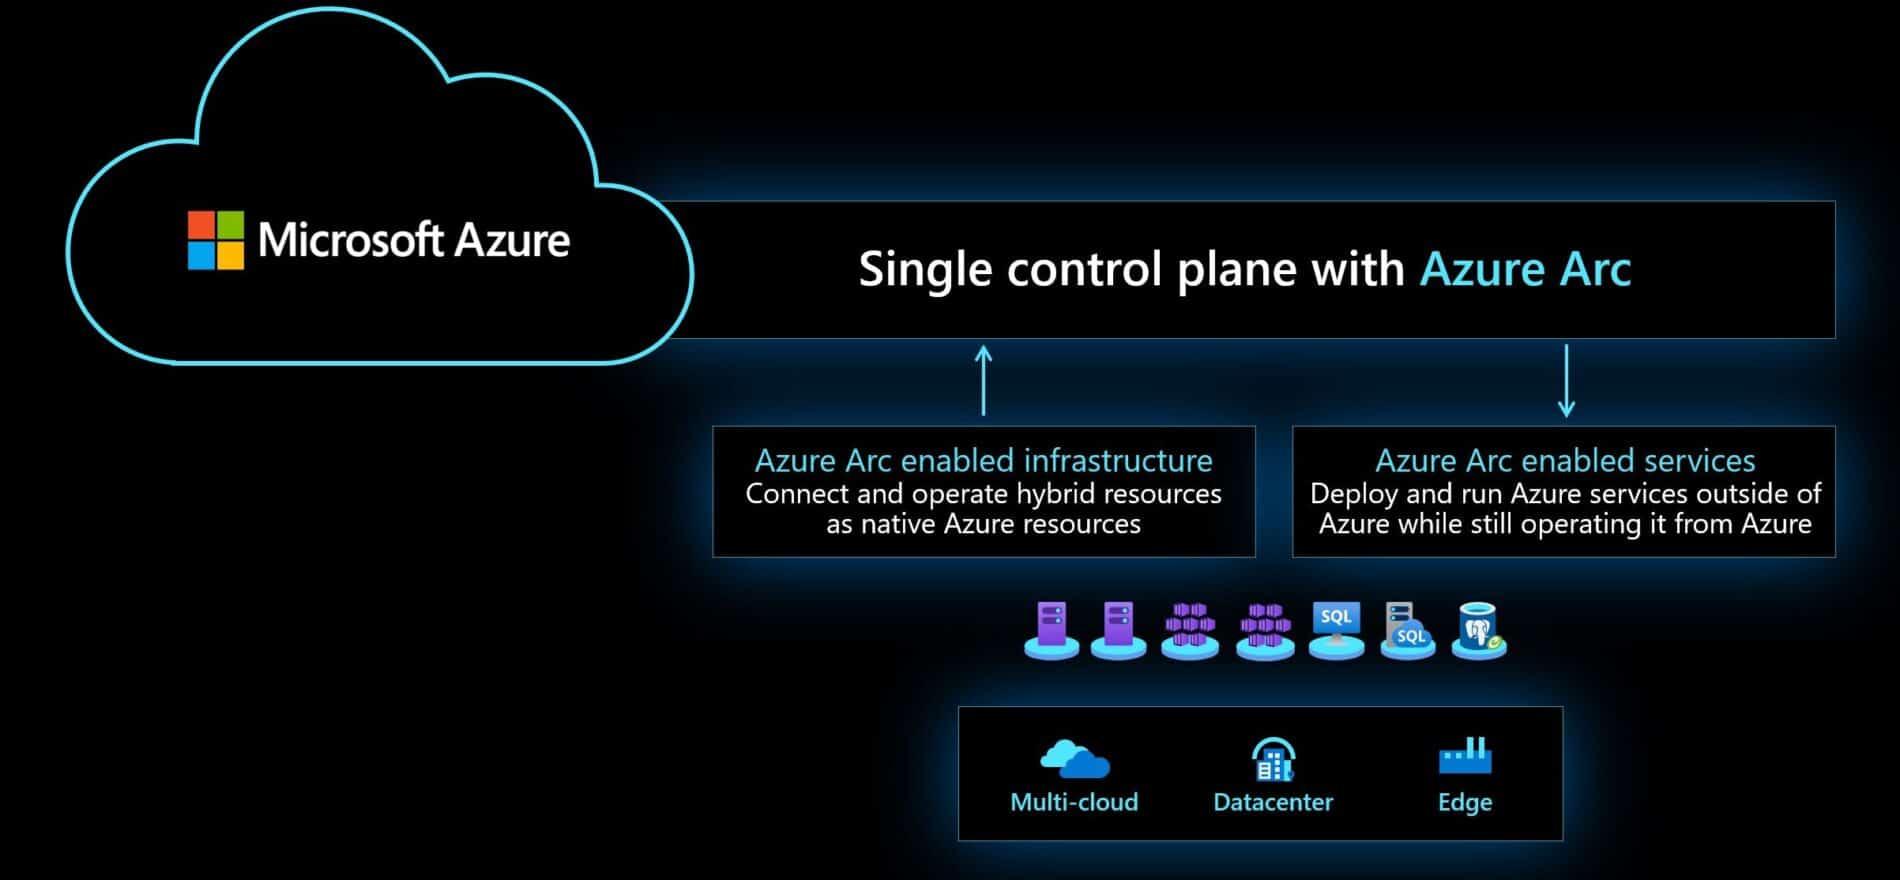 Azure Arc Overview